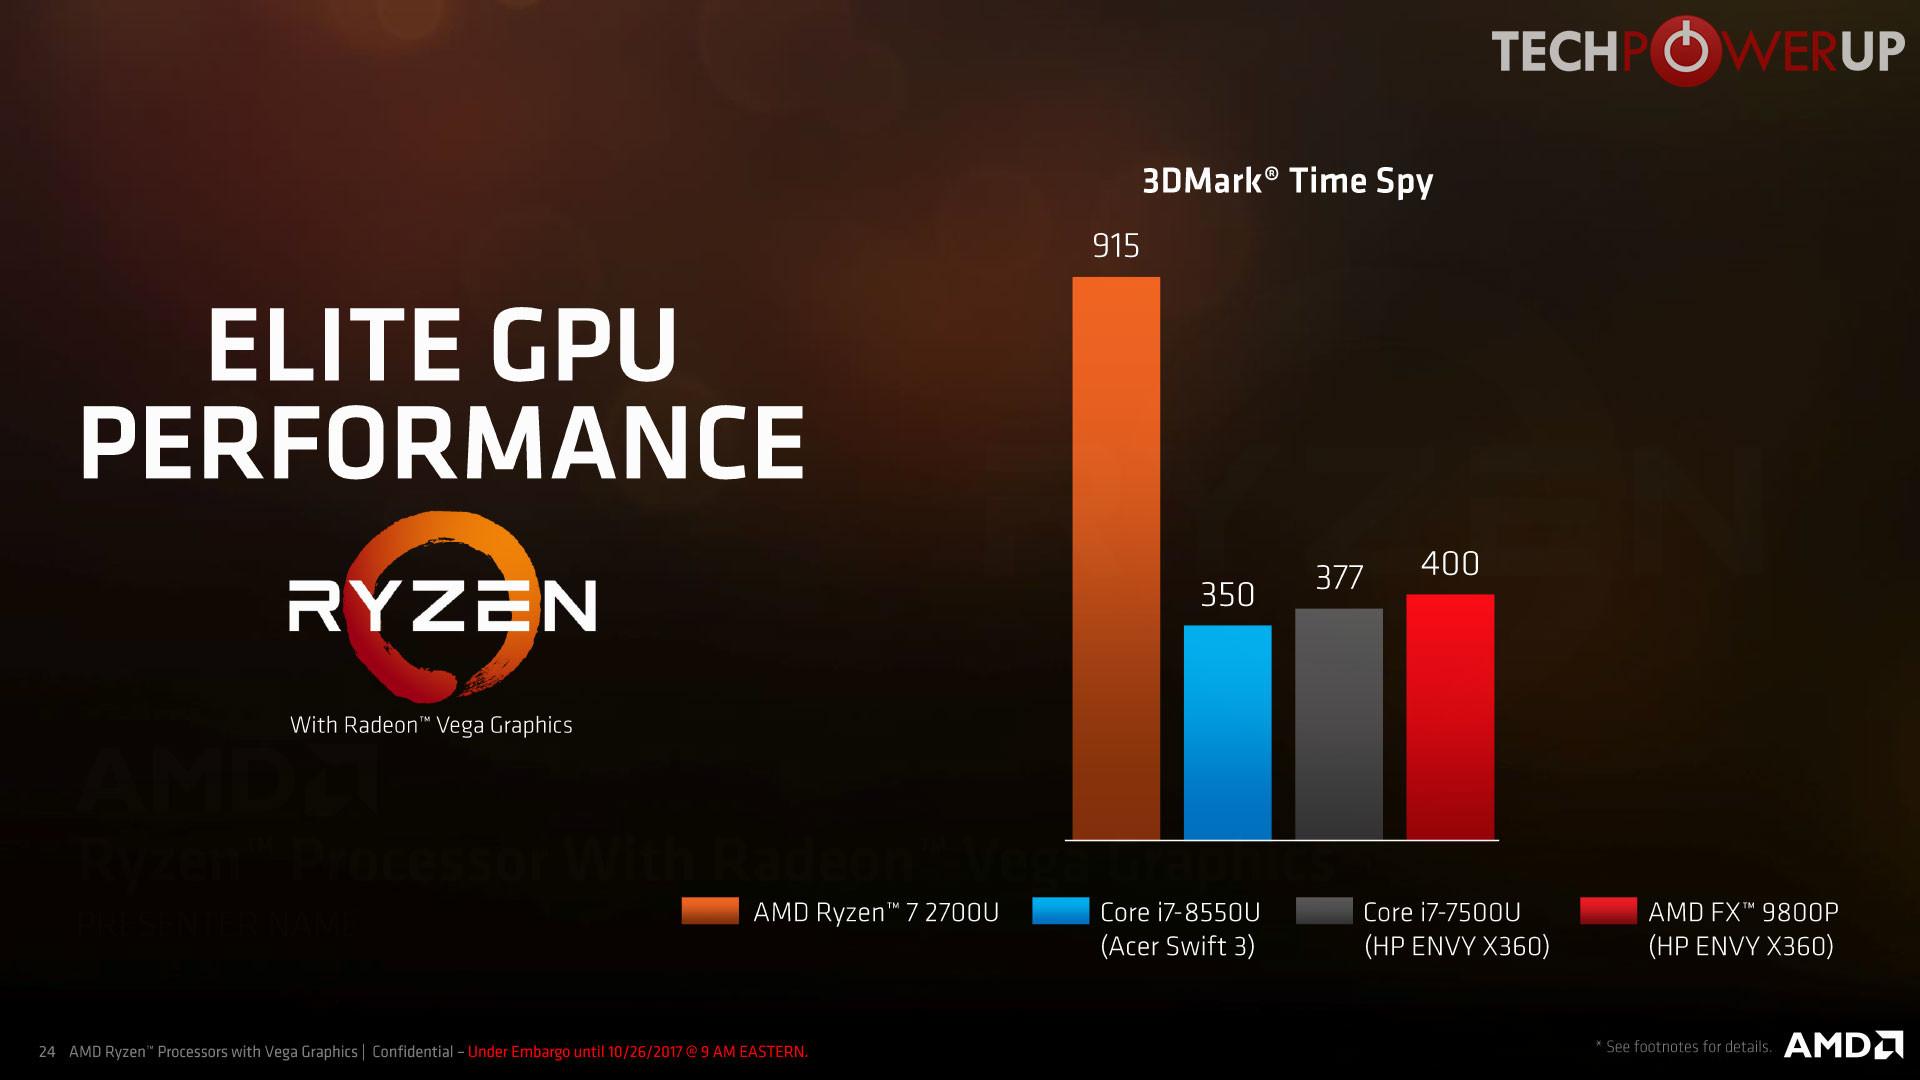 AMD Introduces New Ryzen Mobile Processors | TechPowerUp